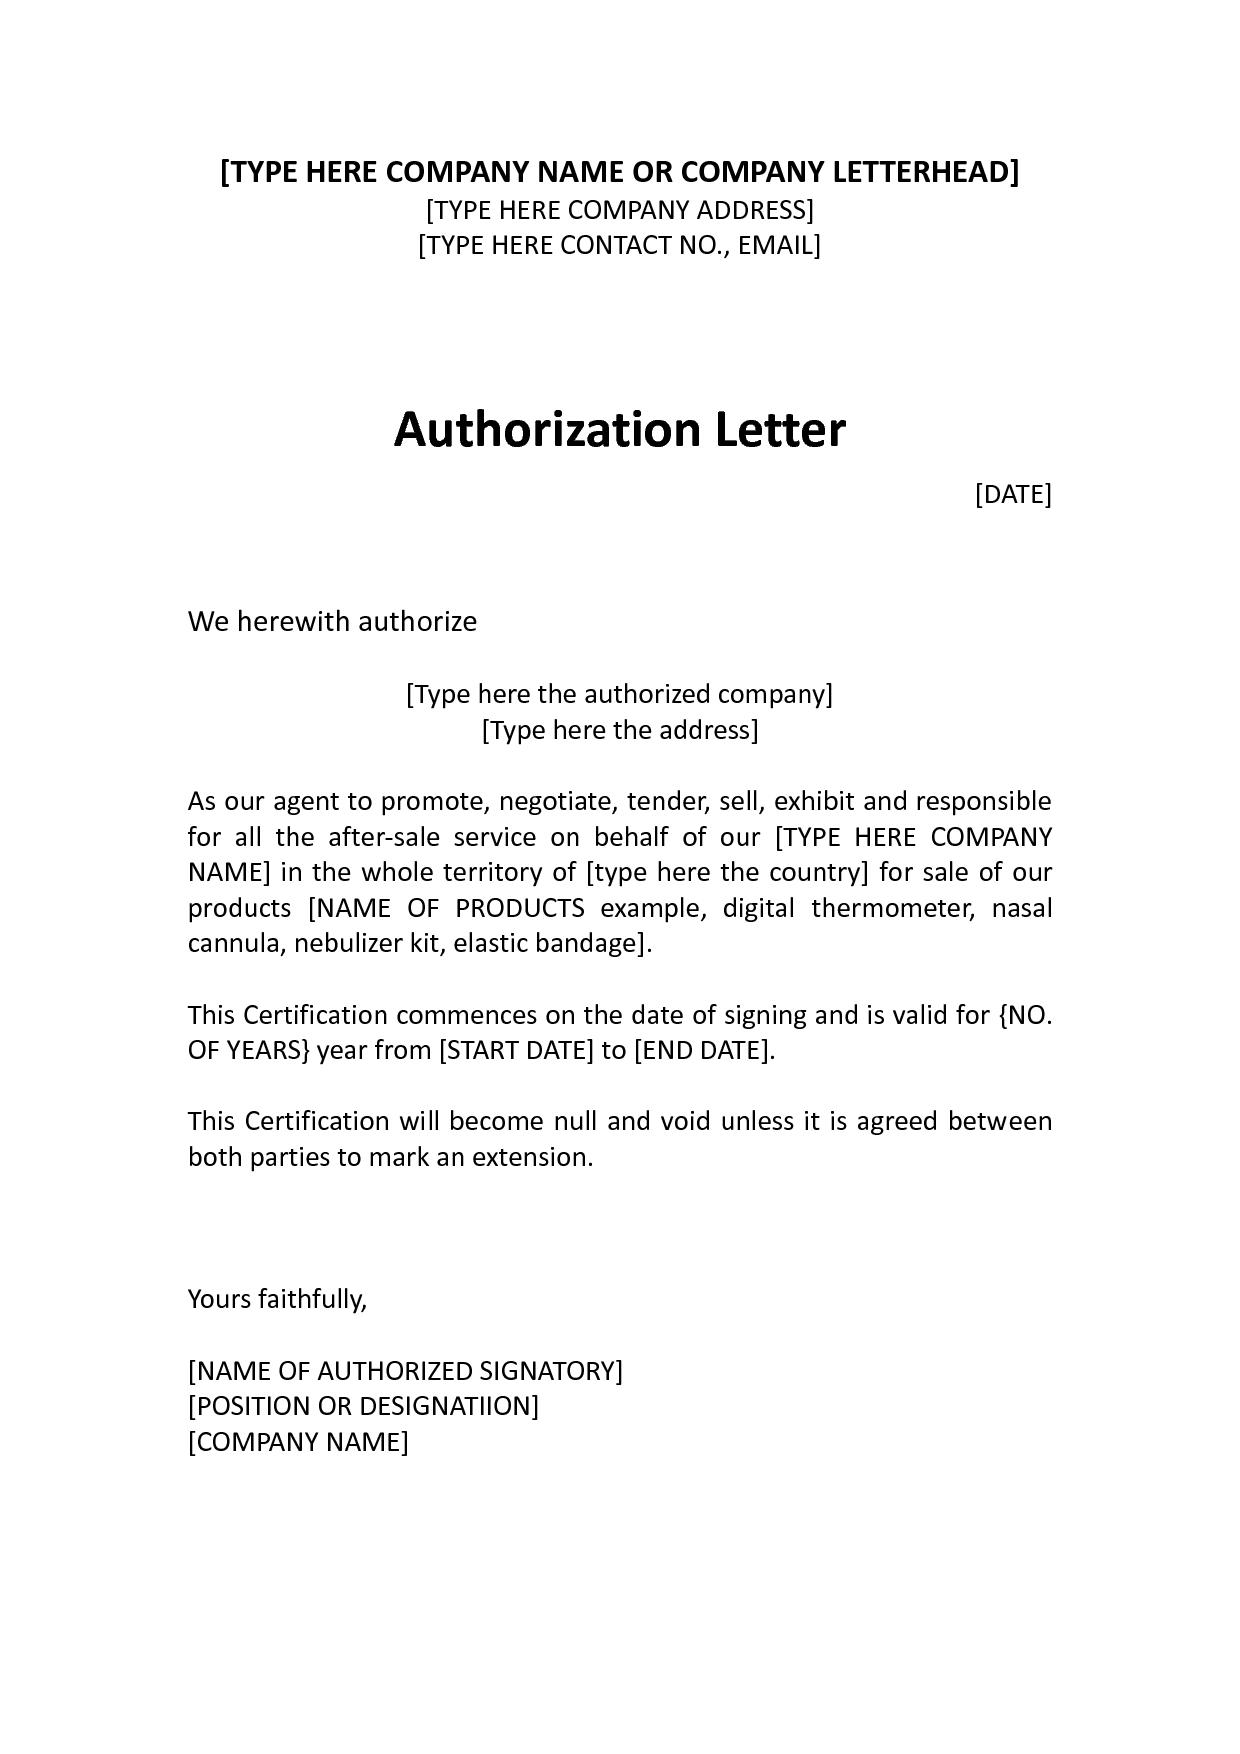 Dear Seller Letter Template - Authorization Distributor Letter Sample Distributor Dealer